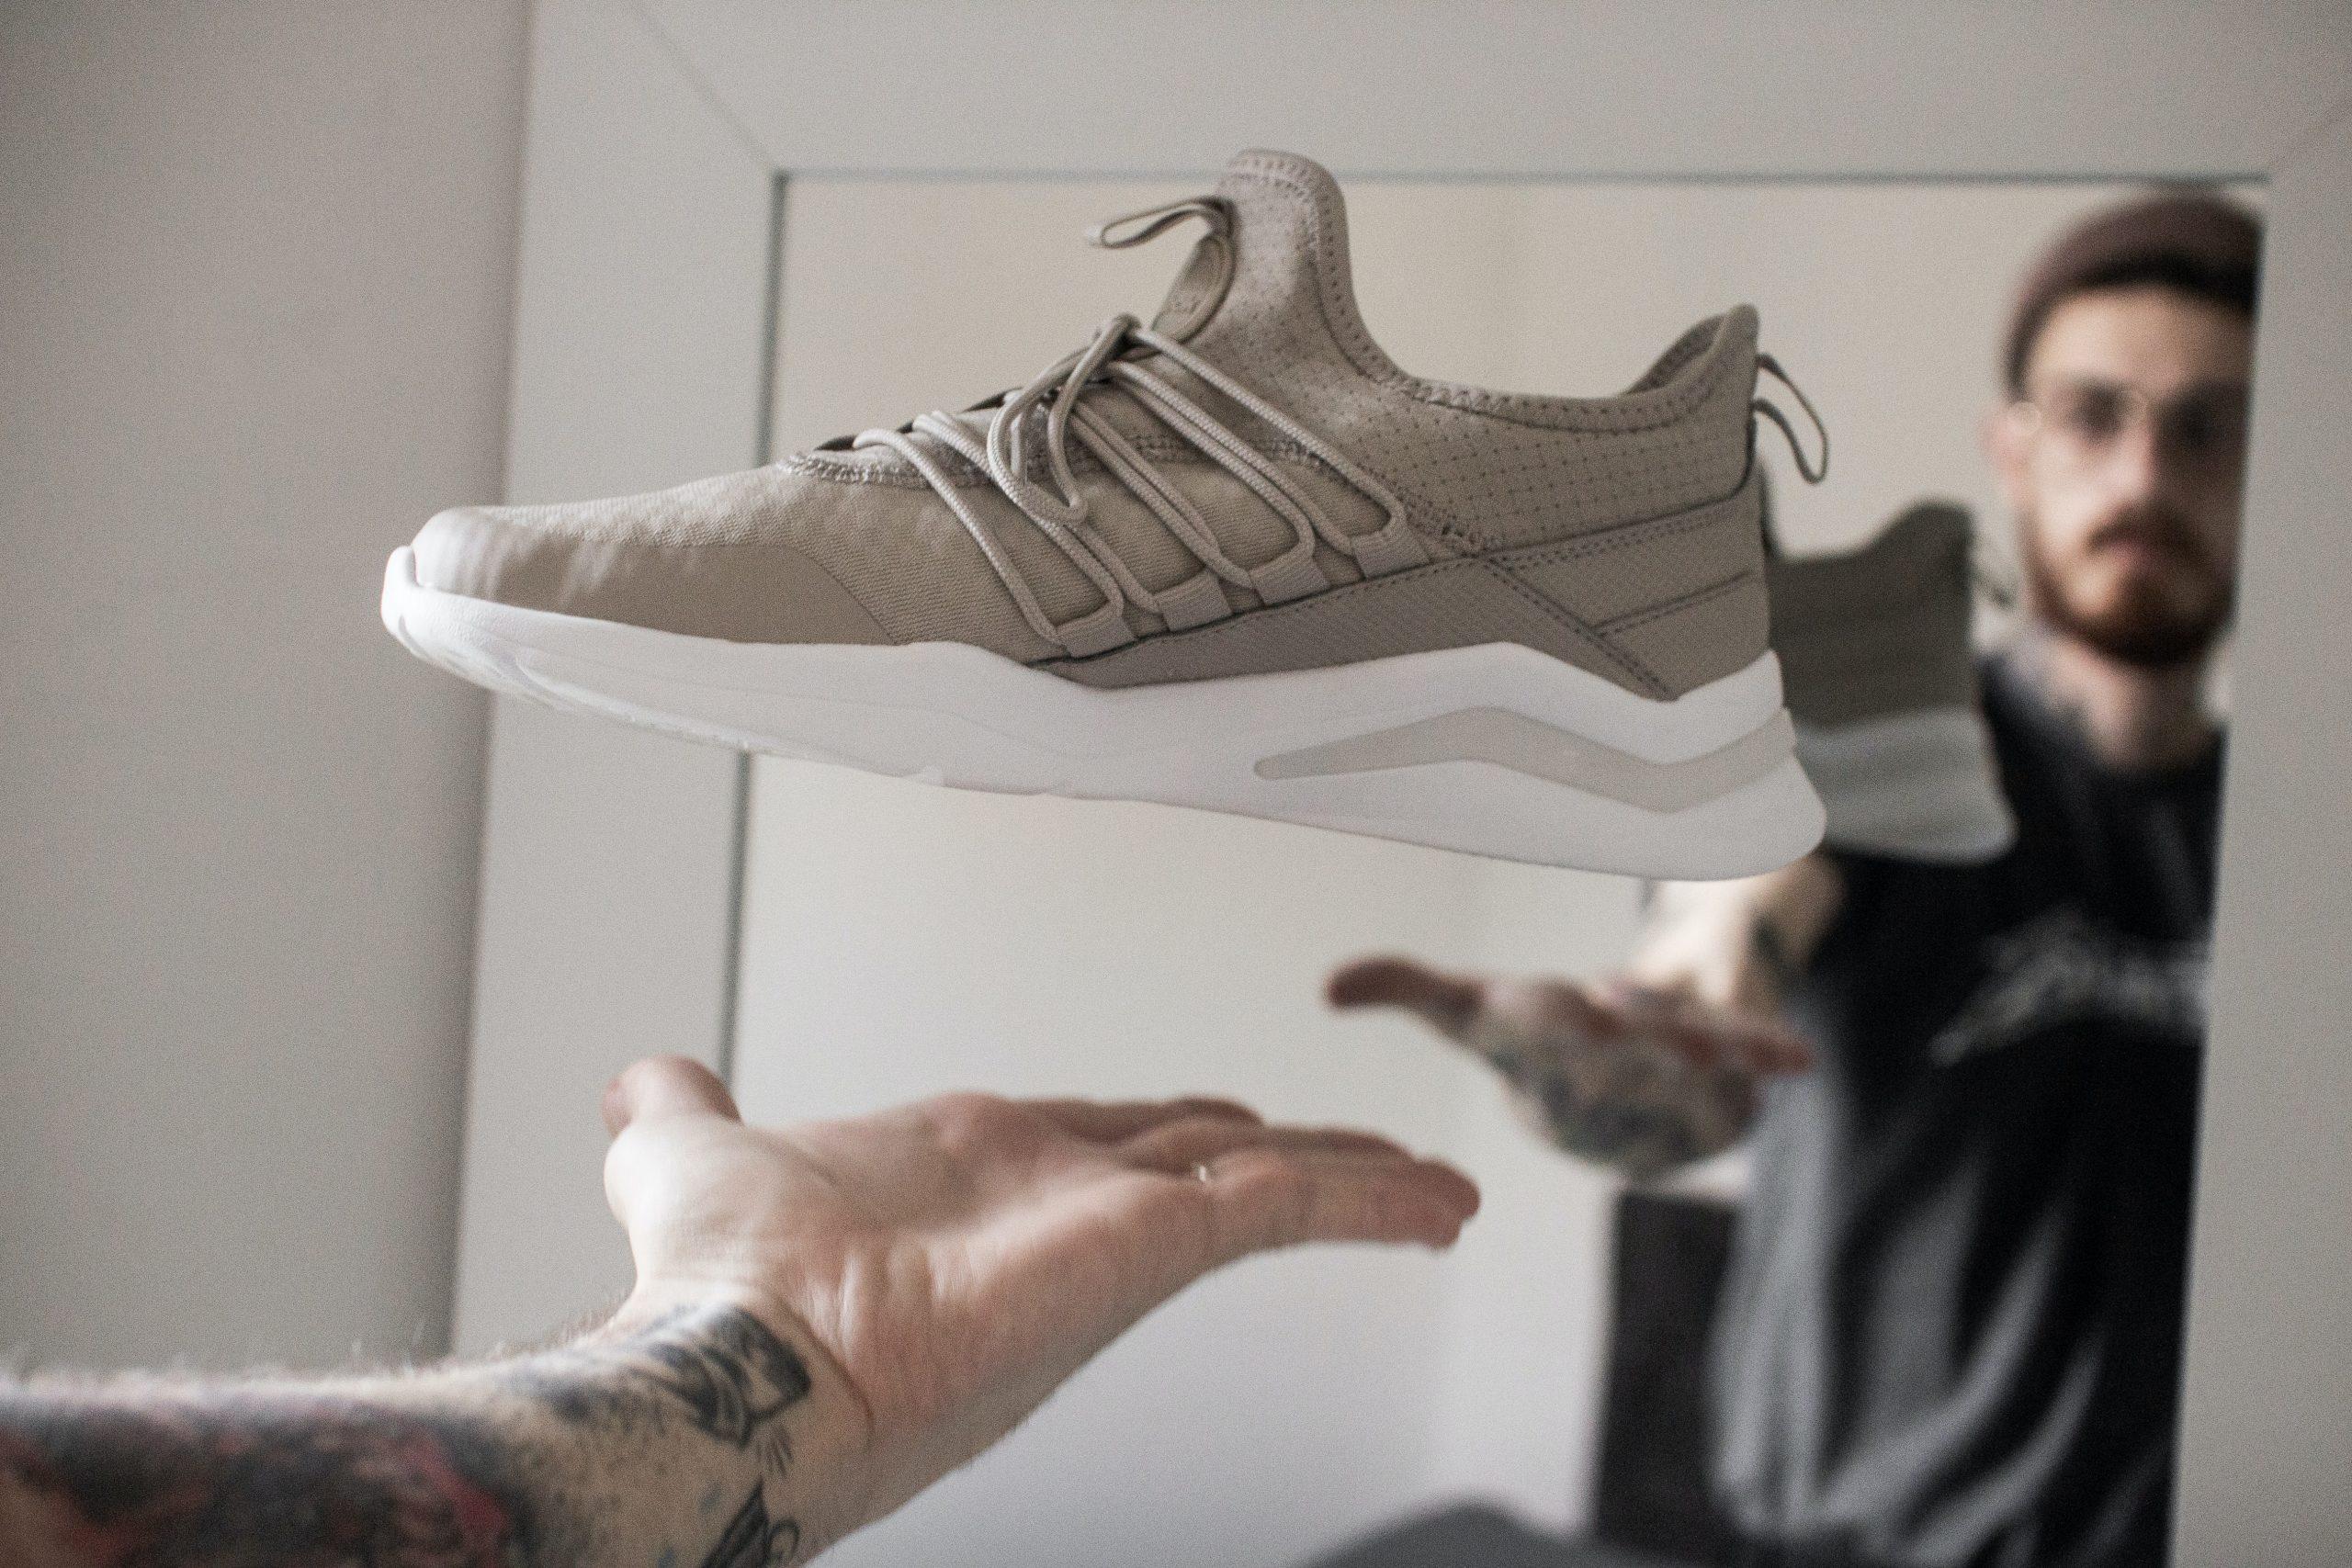 schoenen matchen met outfit